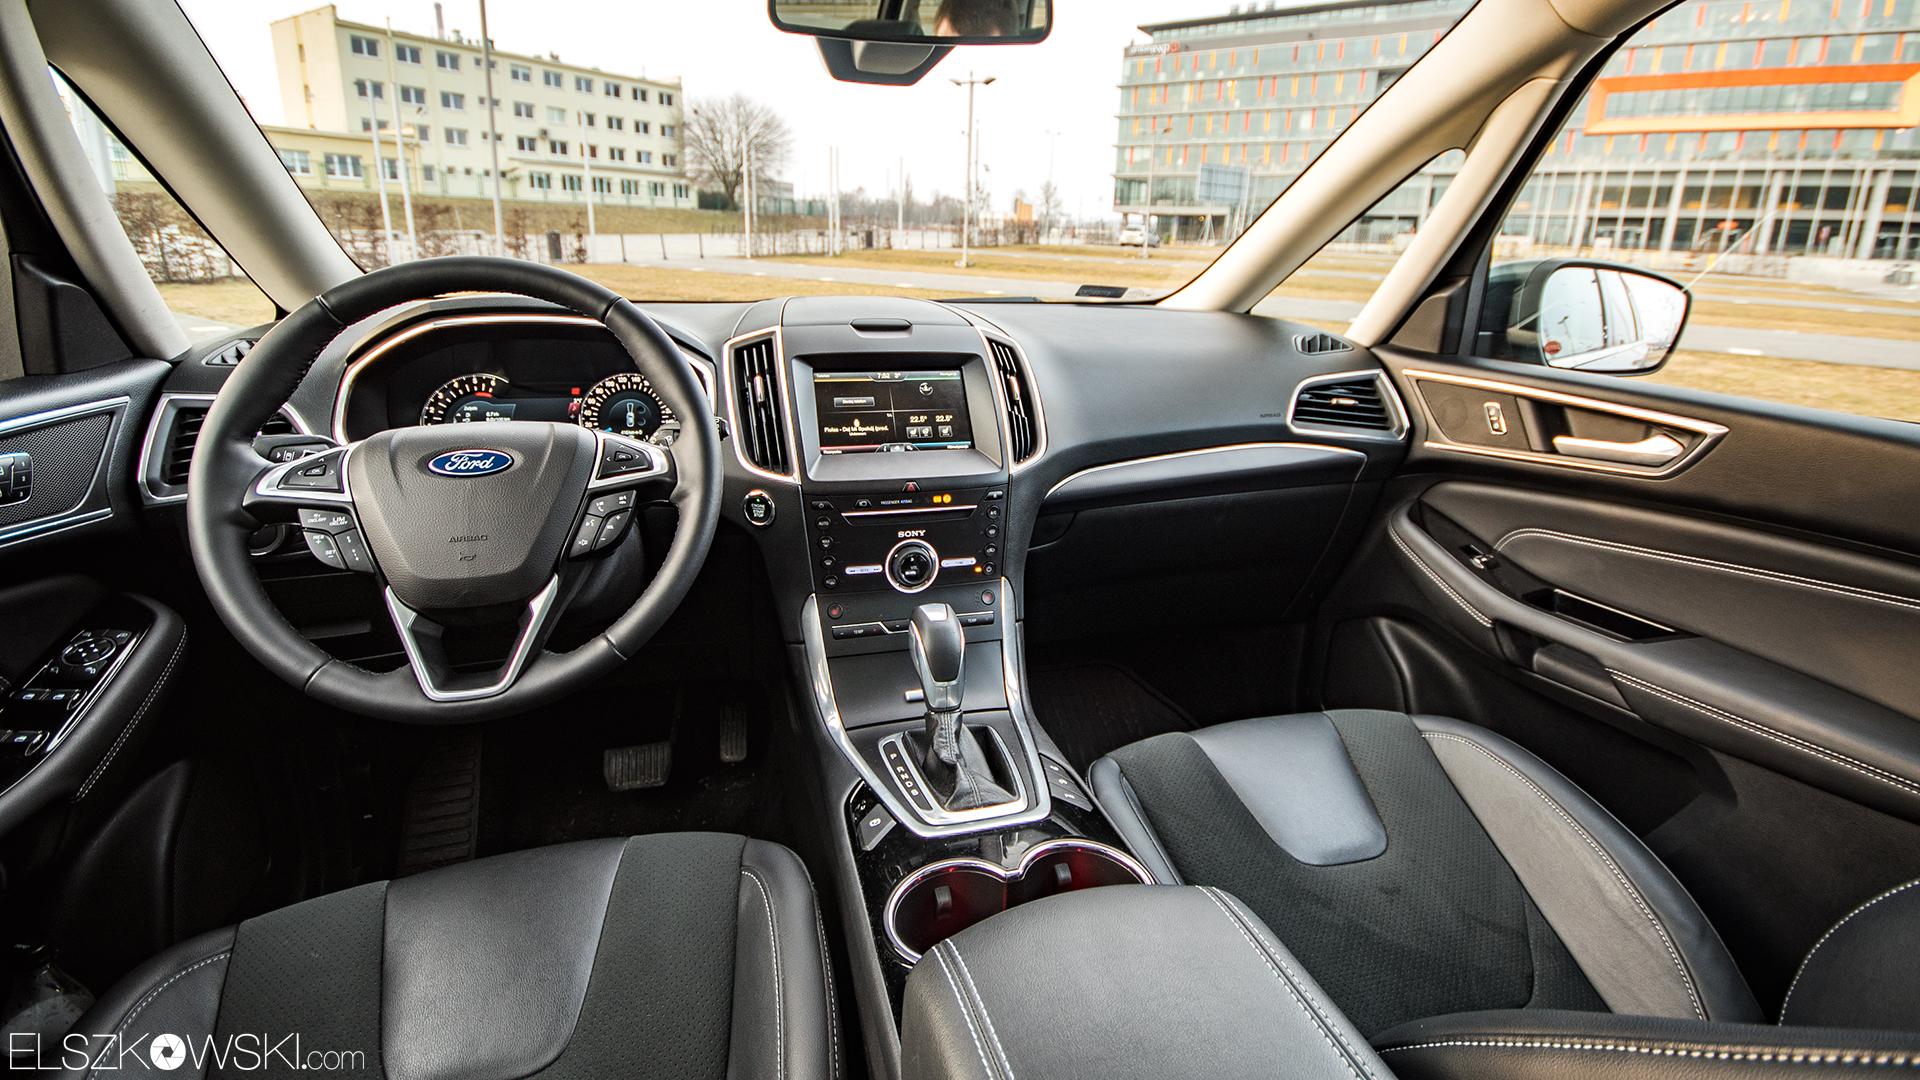 Ford Galaxy 2.0 TDCI PowerShift AWD Titanium